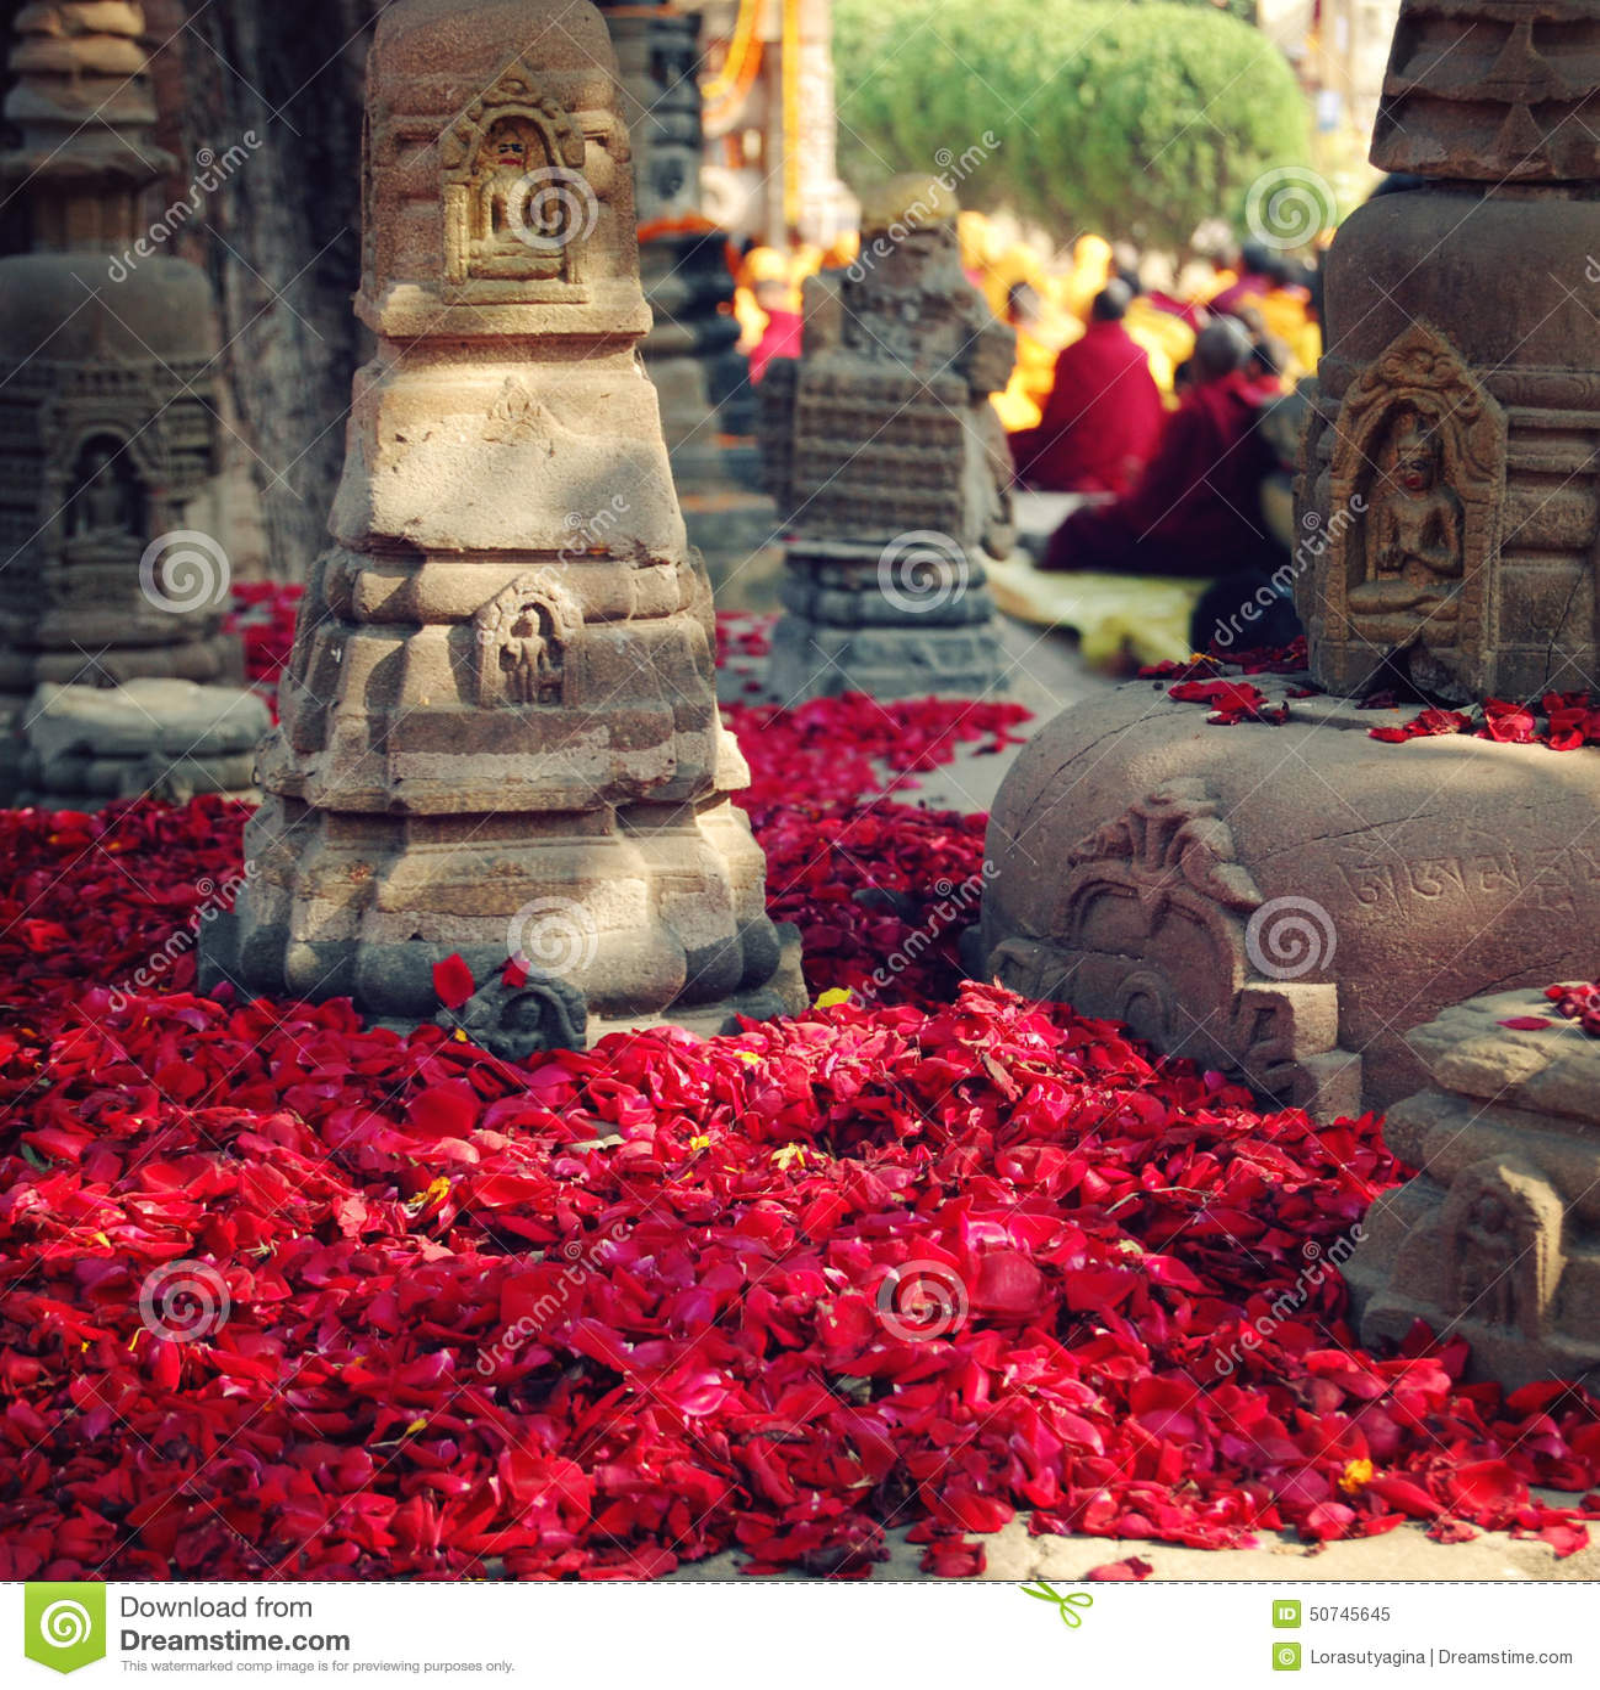 Rose petals for offering respect - retro filter photo. Bodh Gaya.